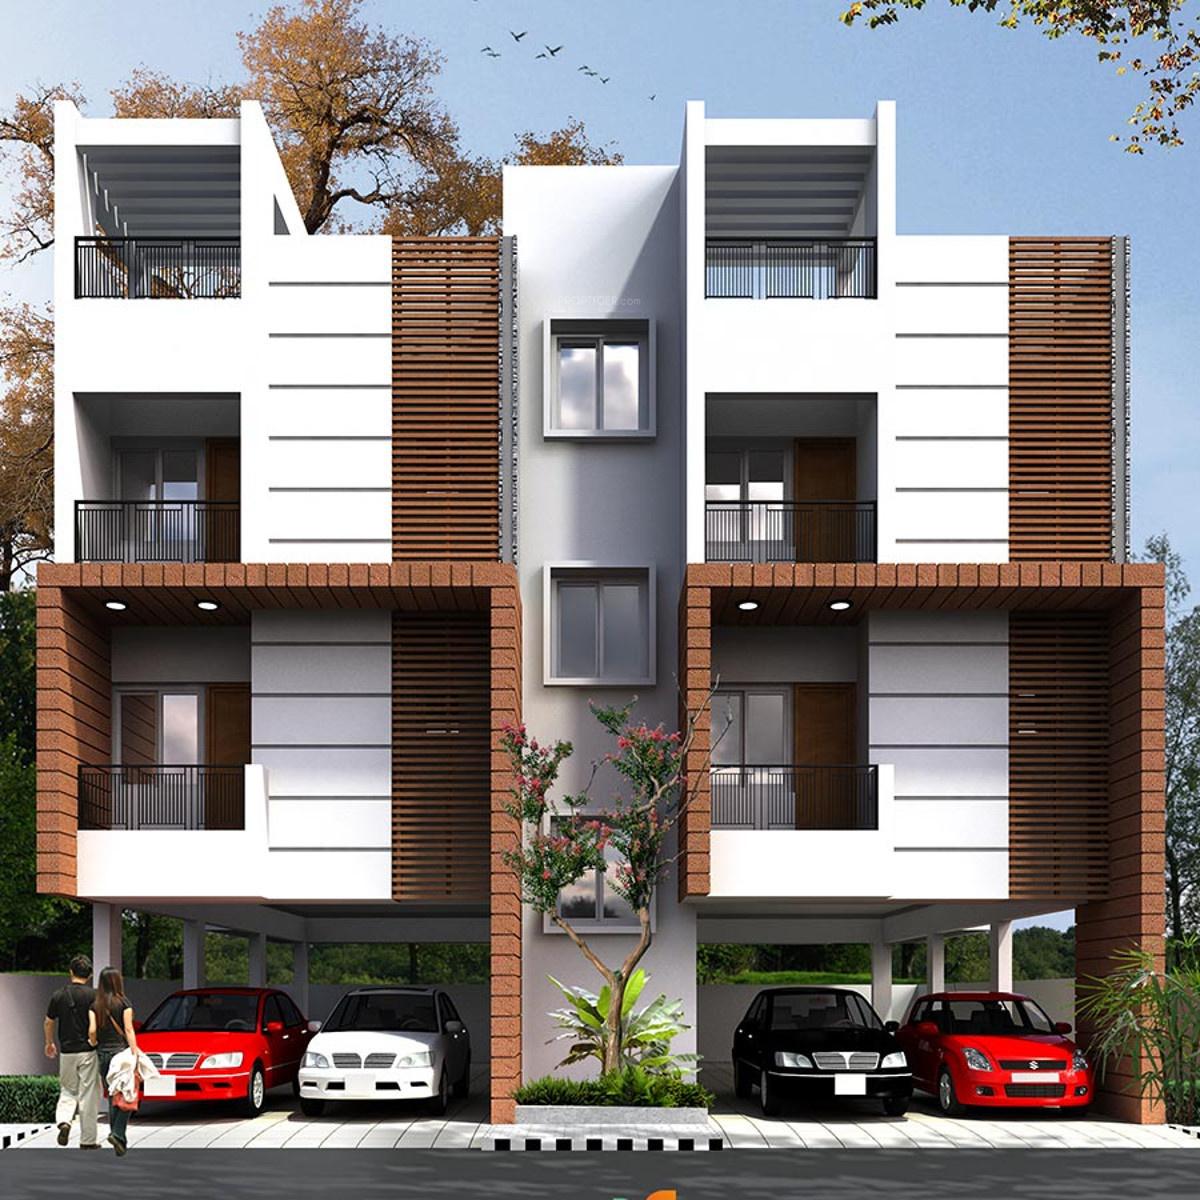 Appartment Reviews: Malles Akankssha Apartment In Perumbakkam, Chennai